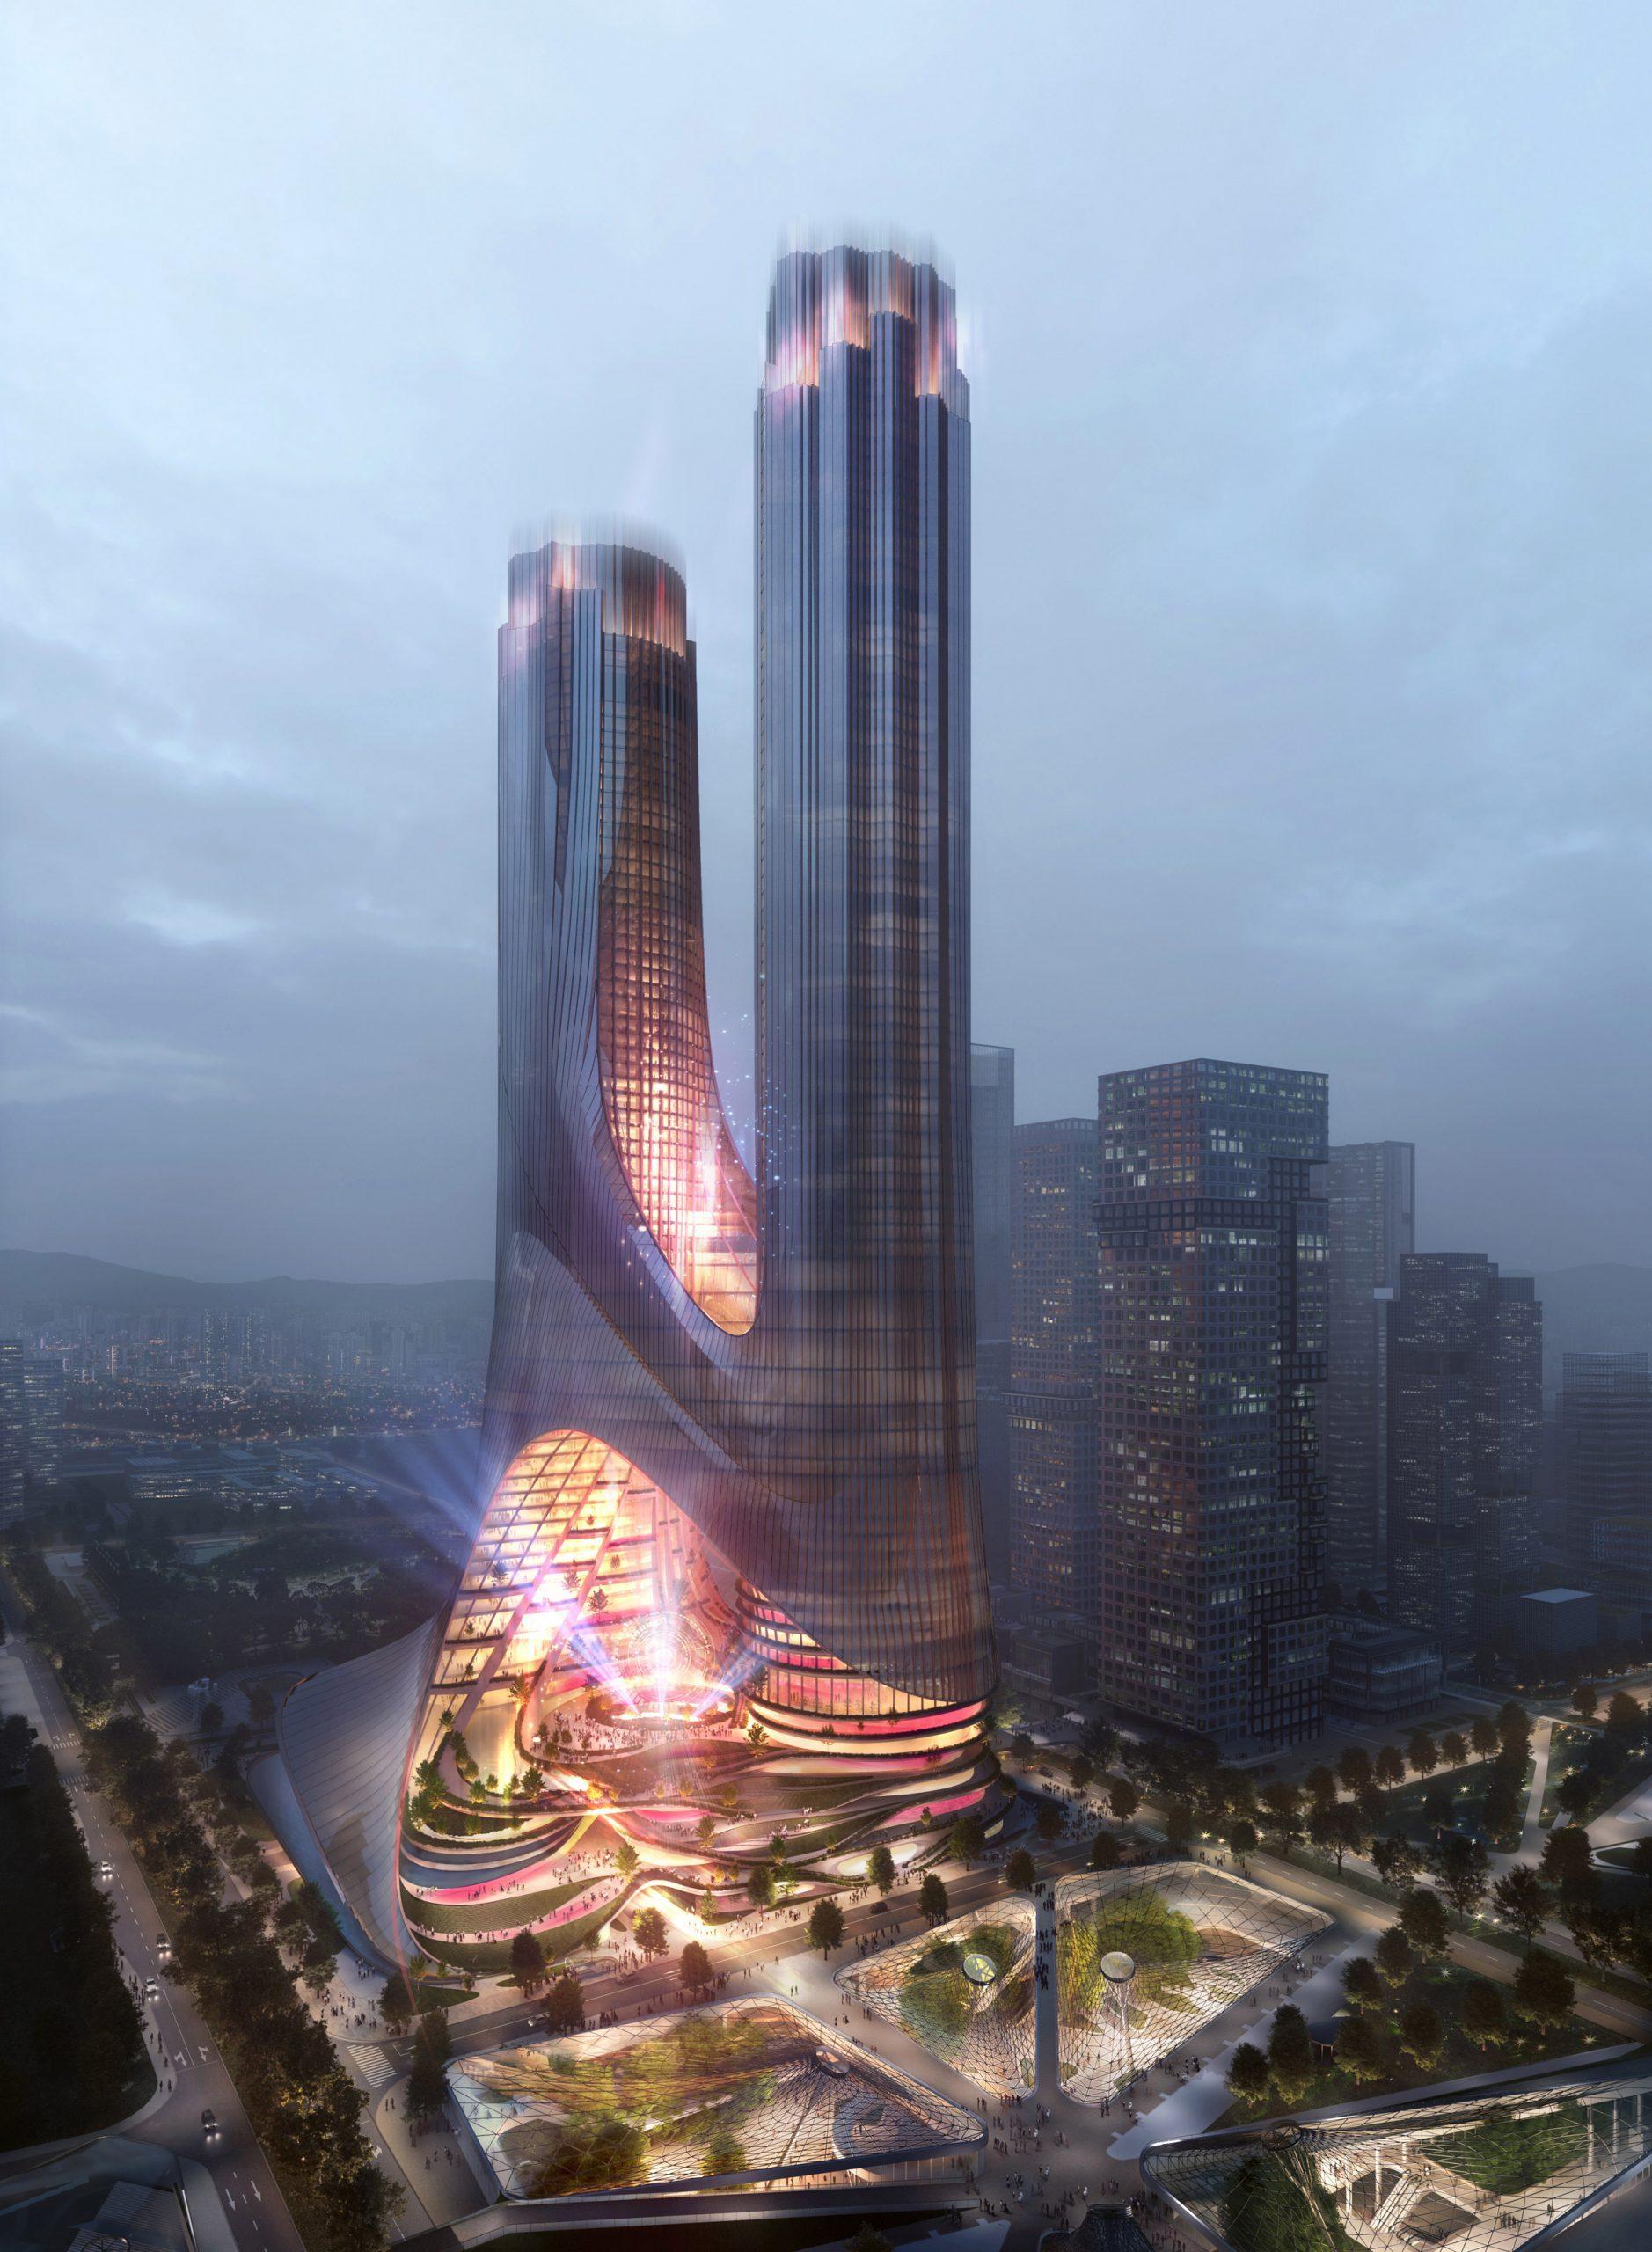 Bild: https://abload.de/img/tower-c-zaha-hadid-arz0ko1.jpg